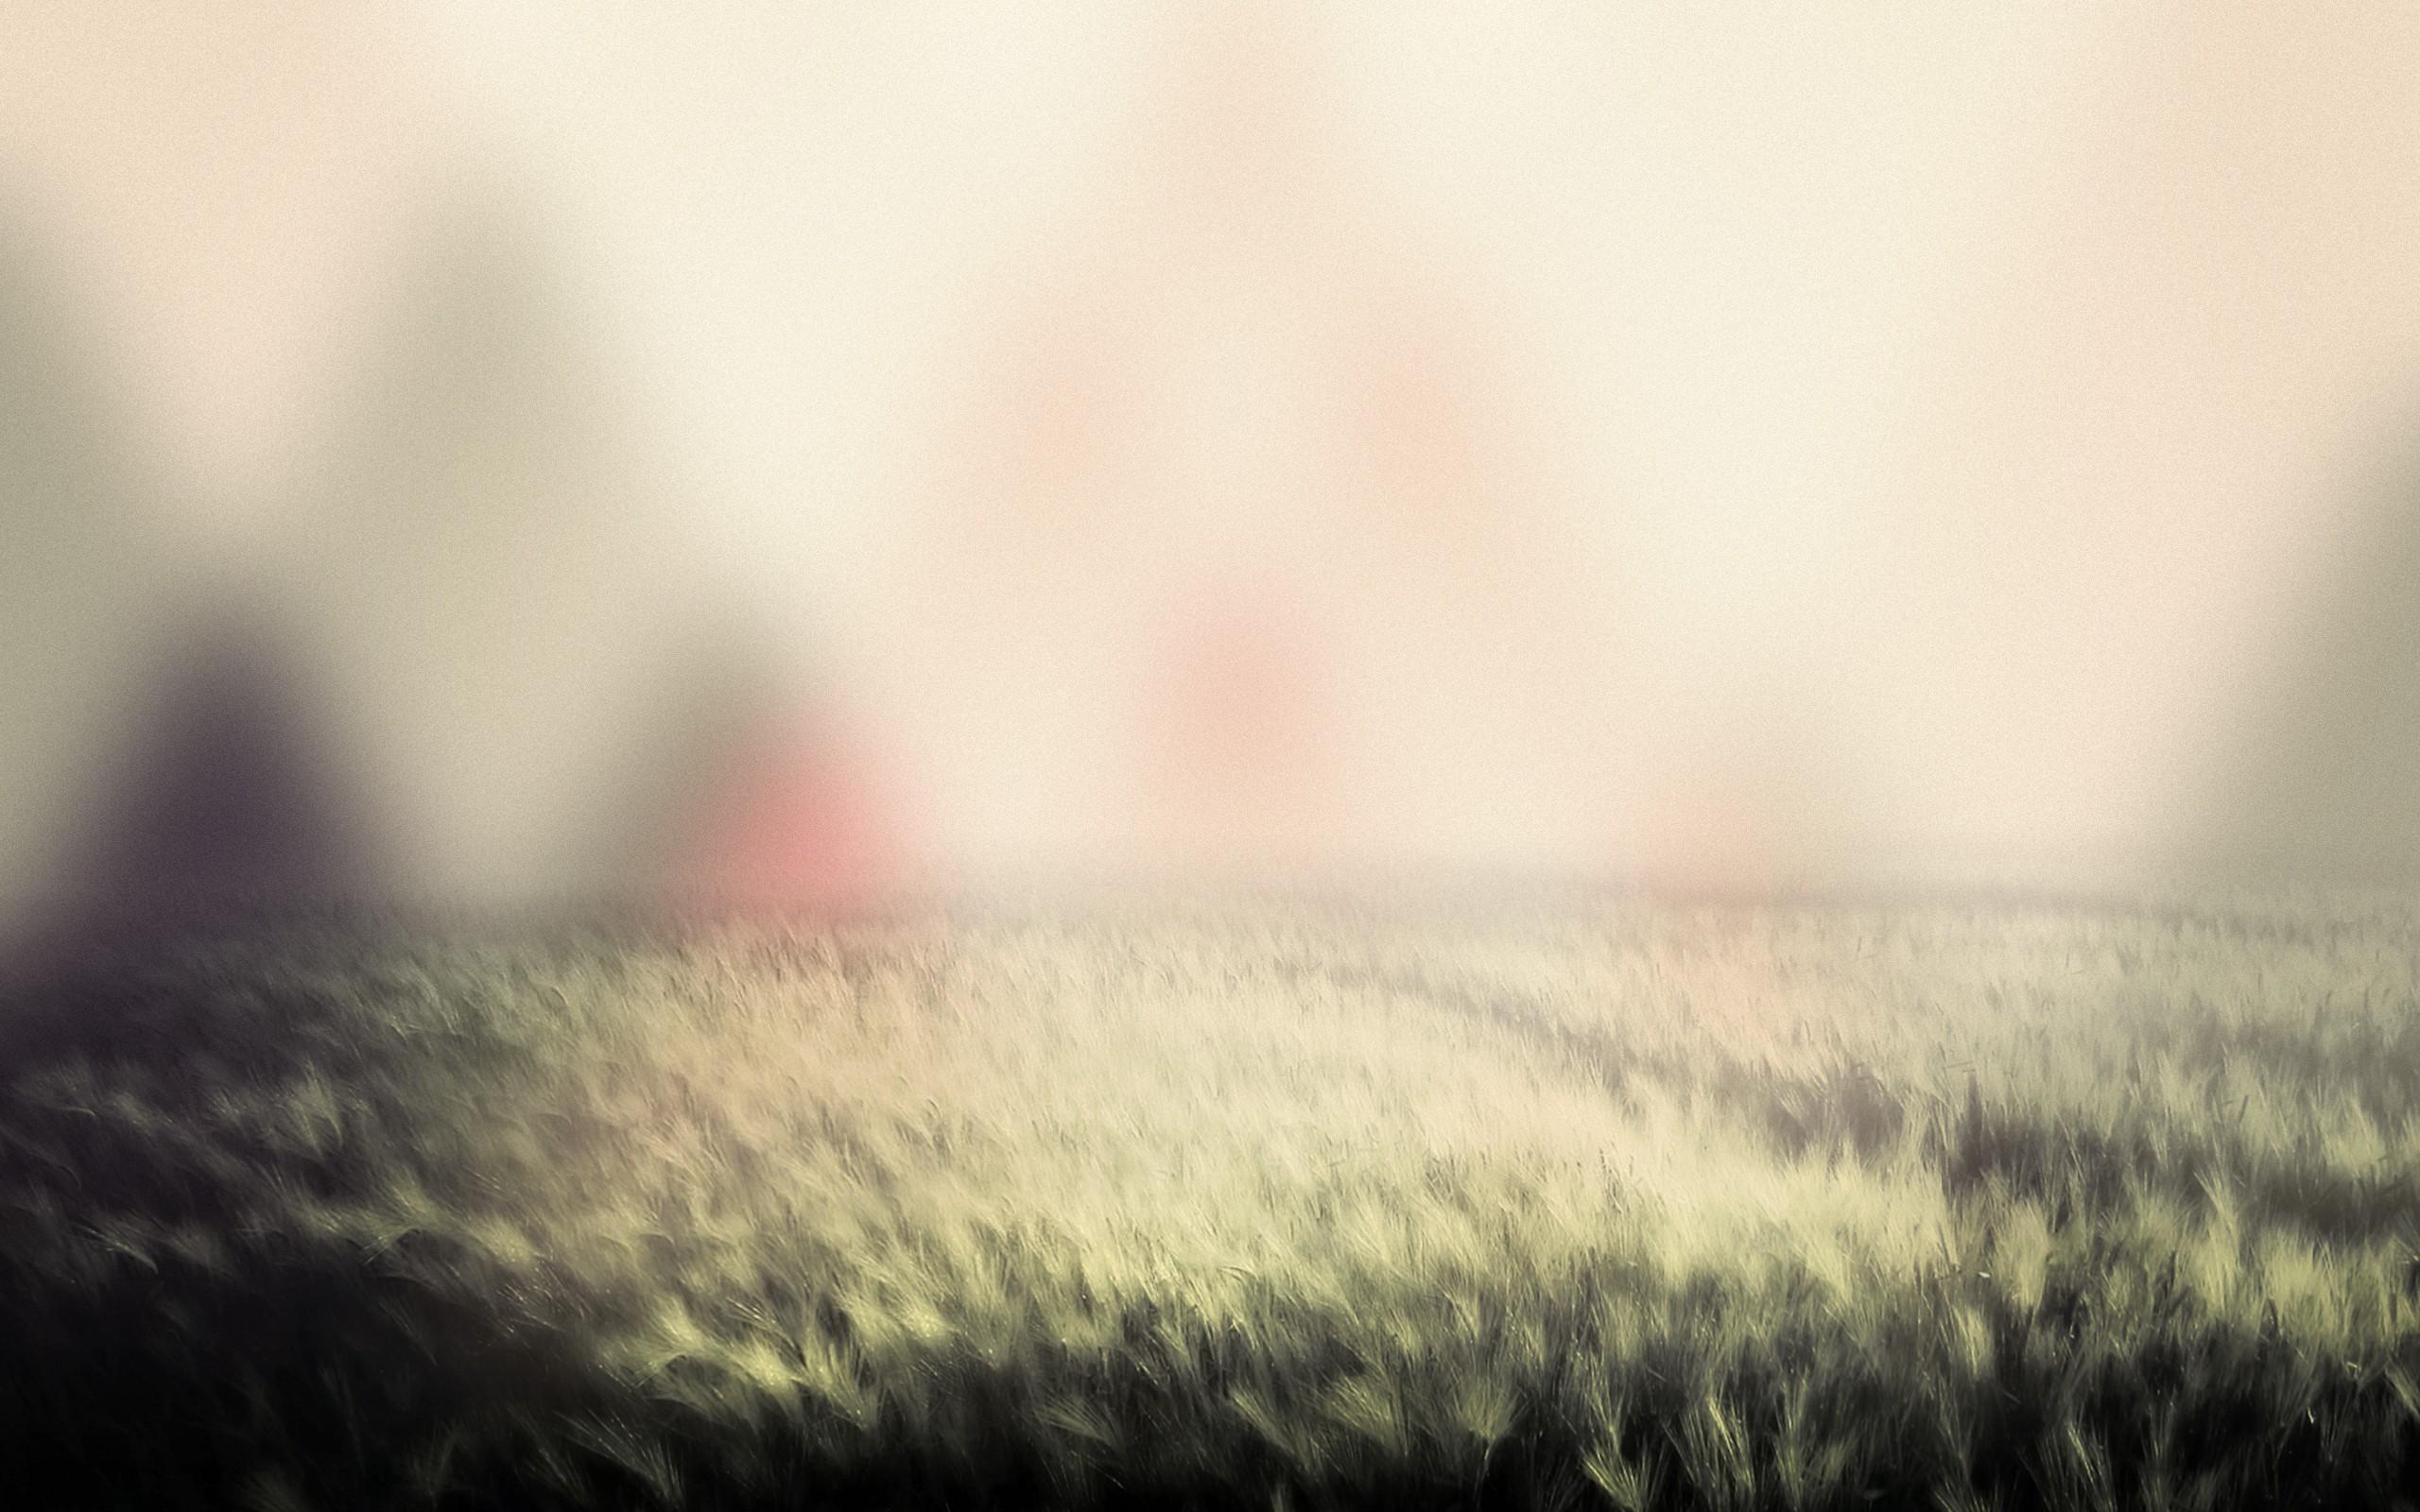 Amazing Blurred Wallpaper